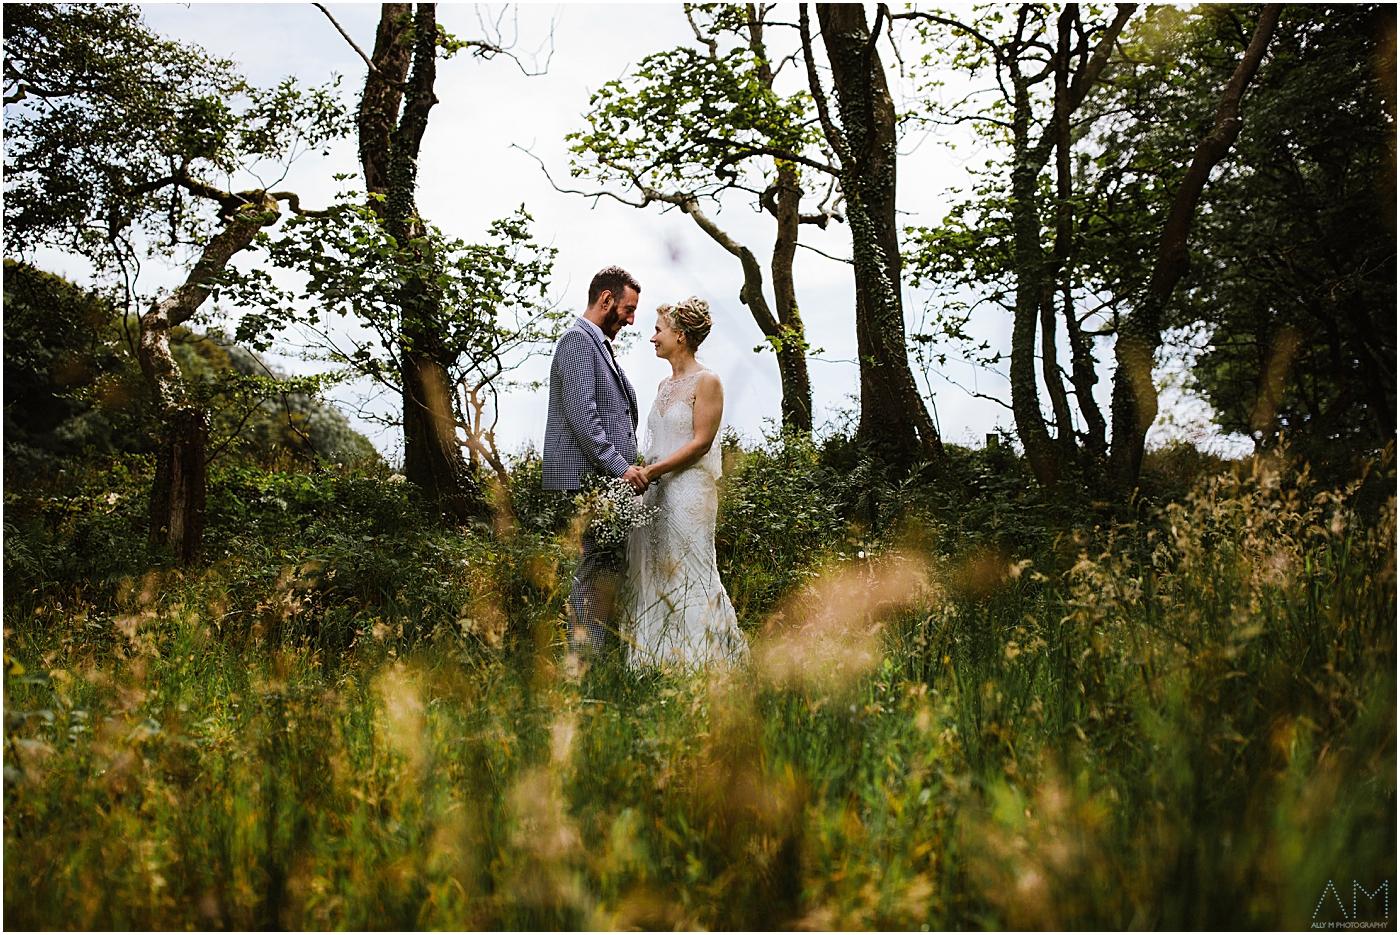 Carreglwyd Anglesey Wedding Photography